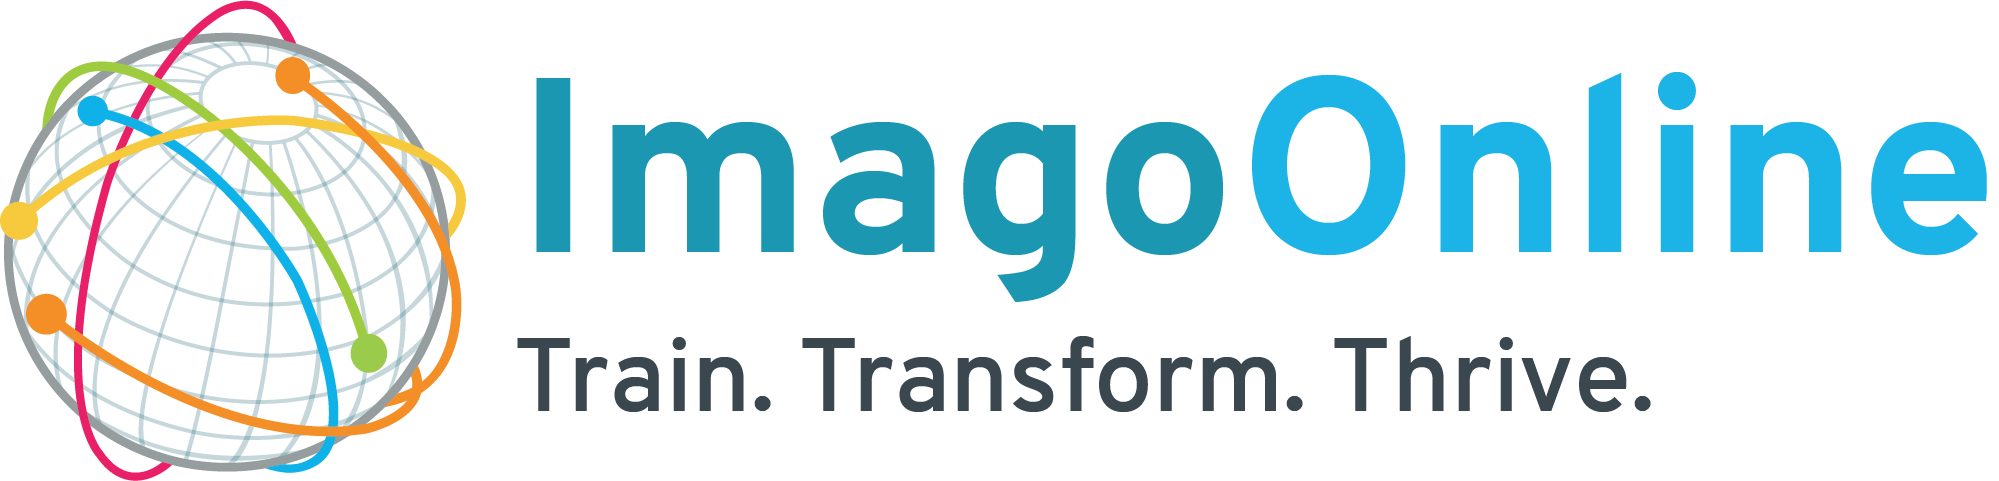 Imago Online Banner Logo